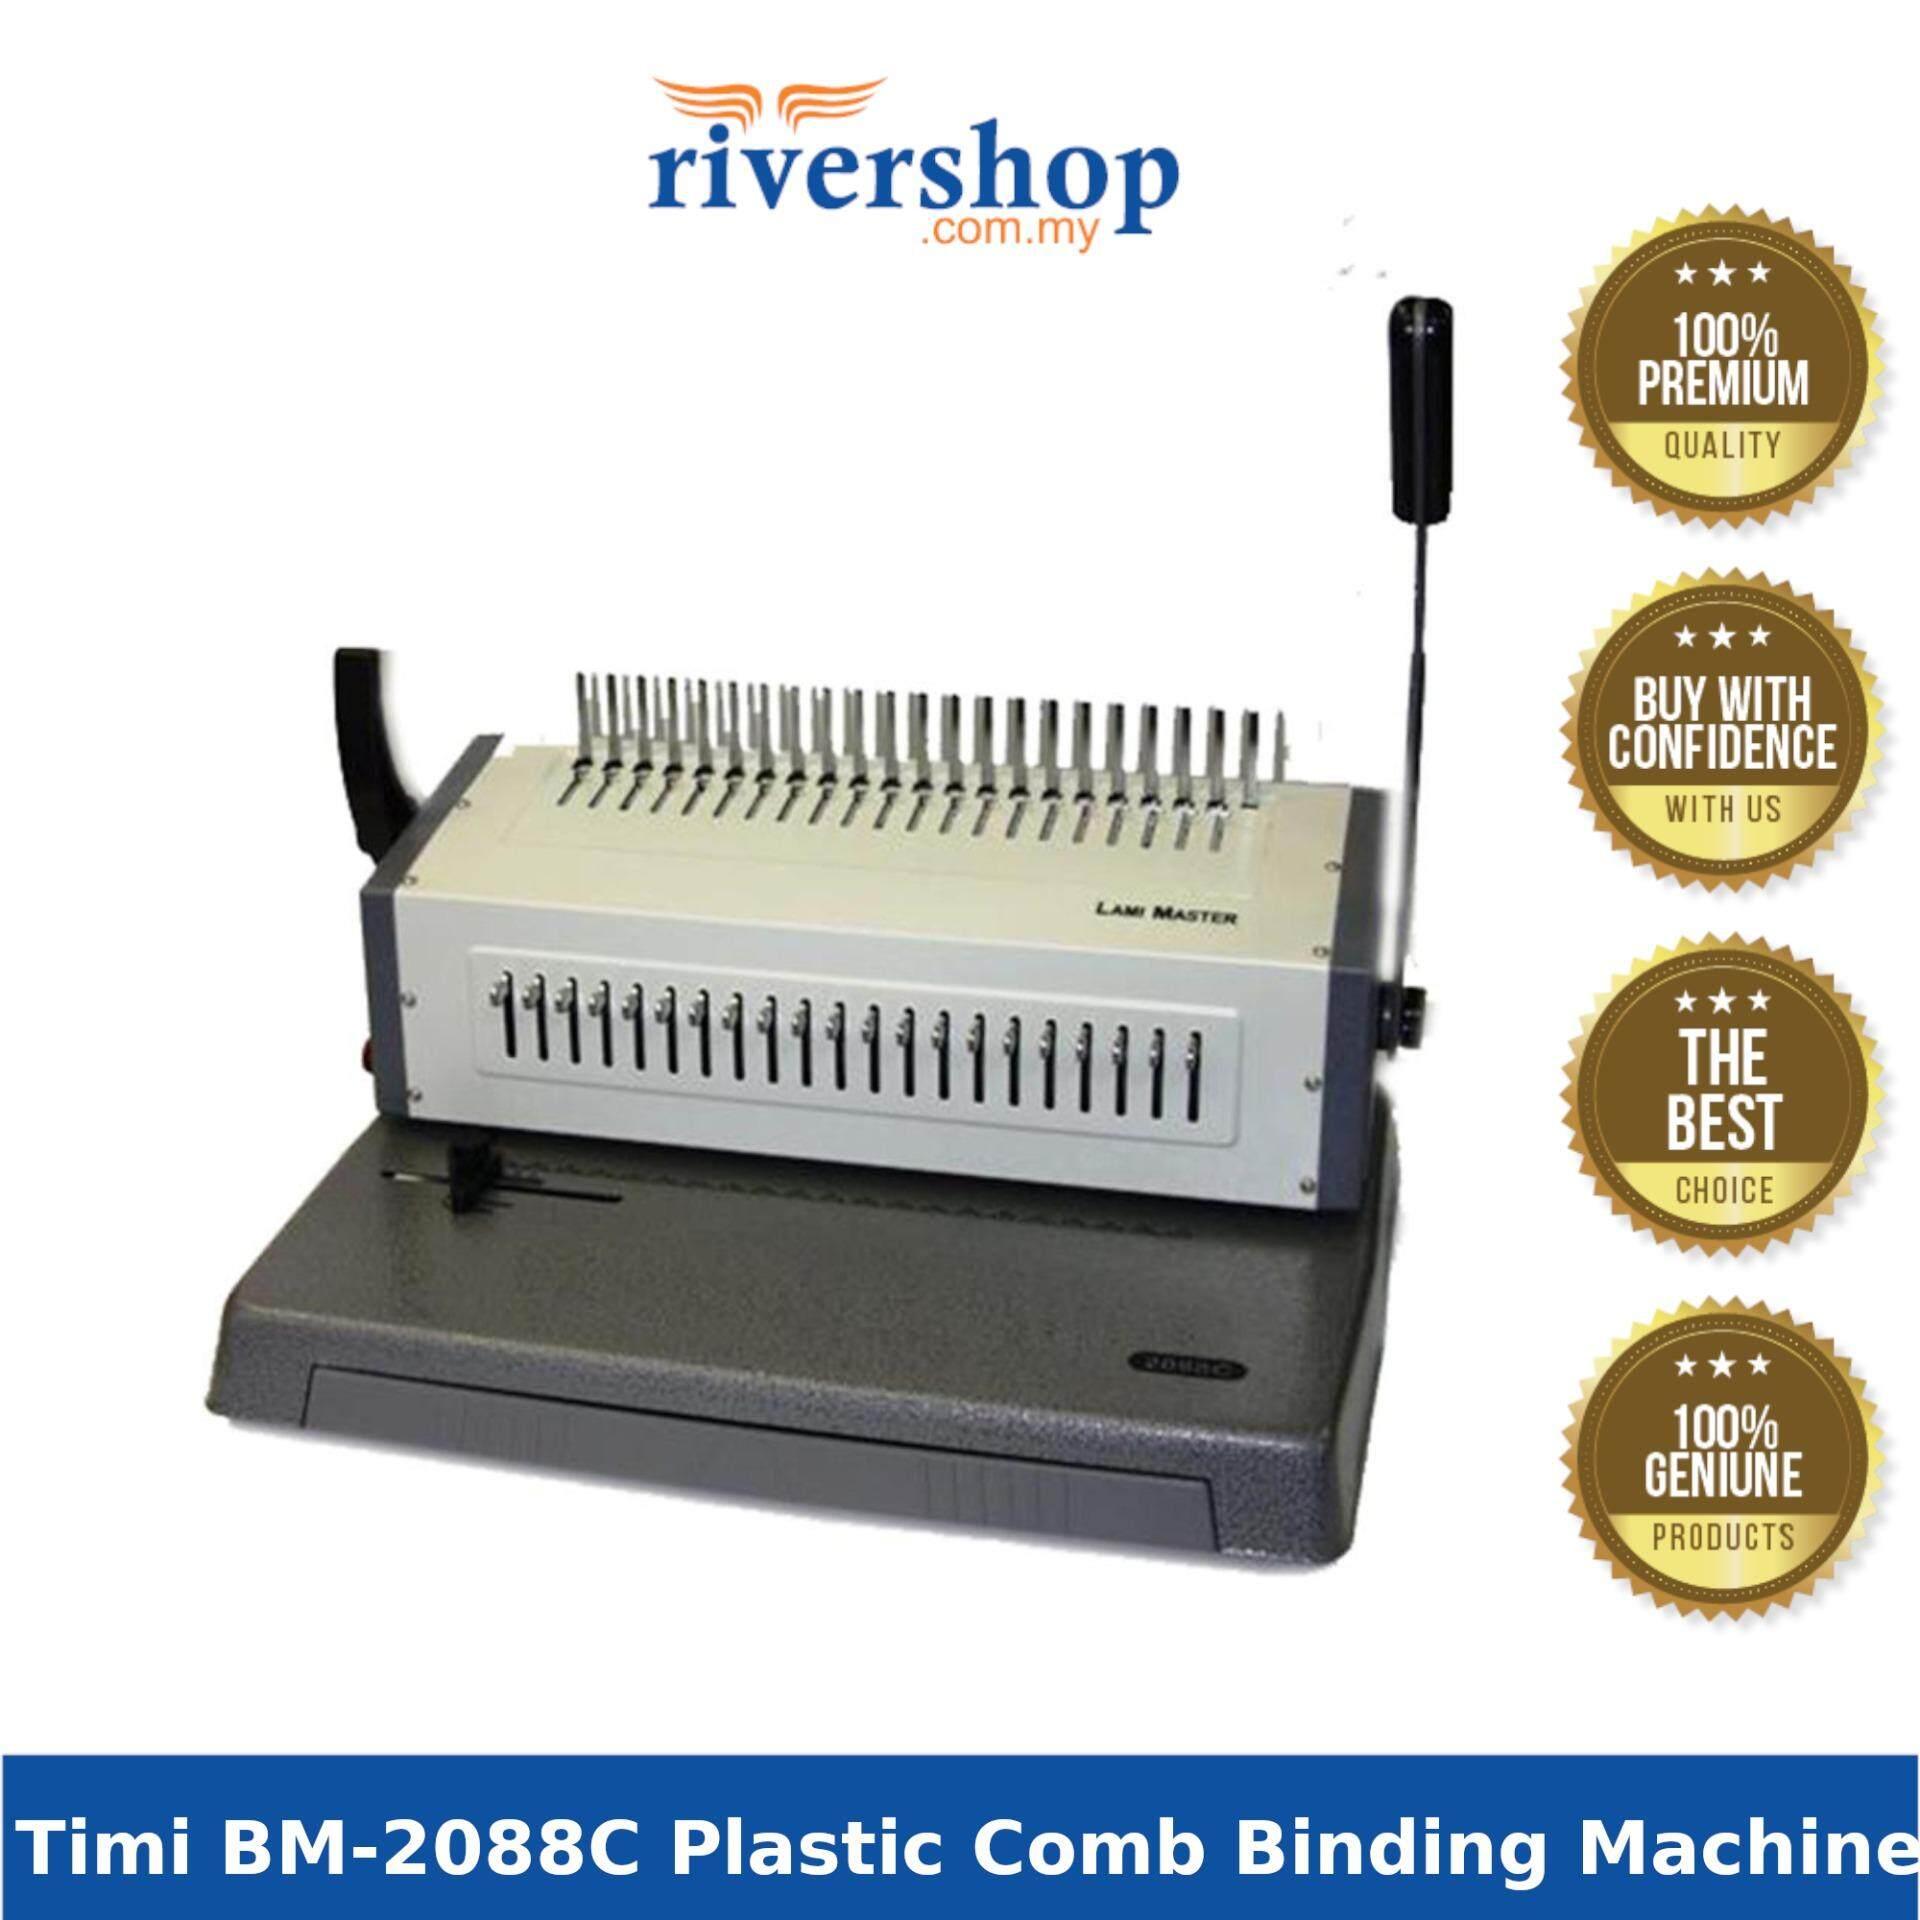 Timi Plastic Comb Binding Machine BM-2088C